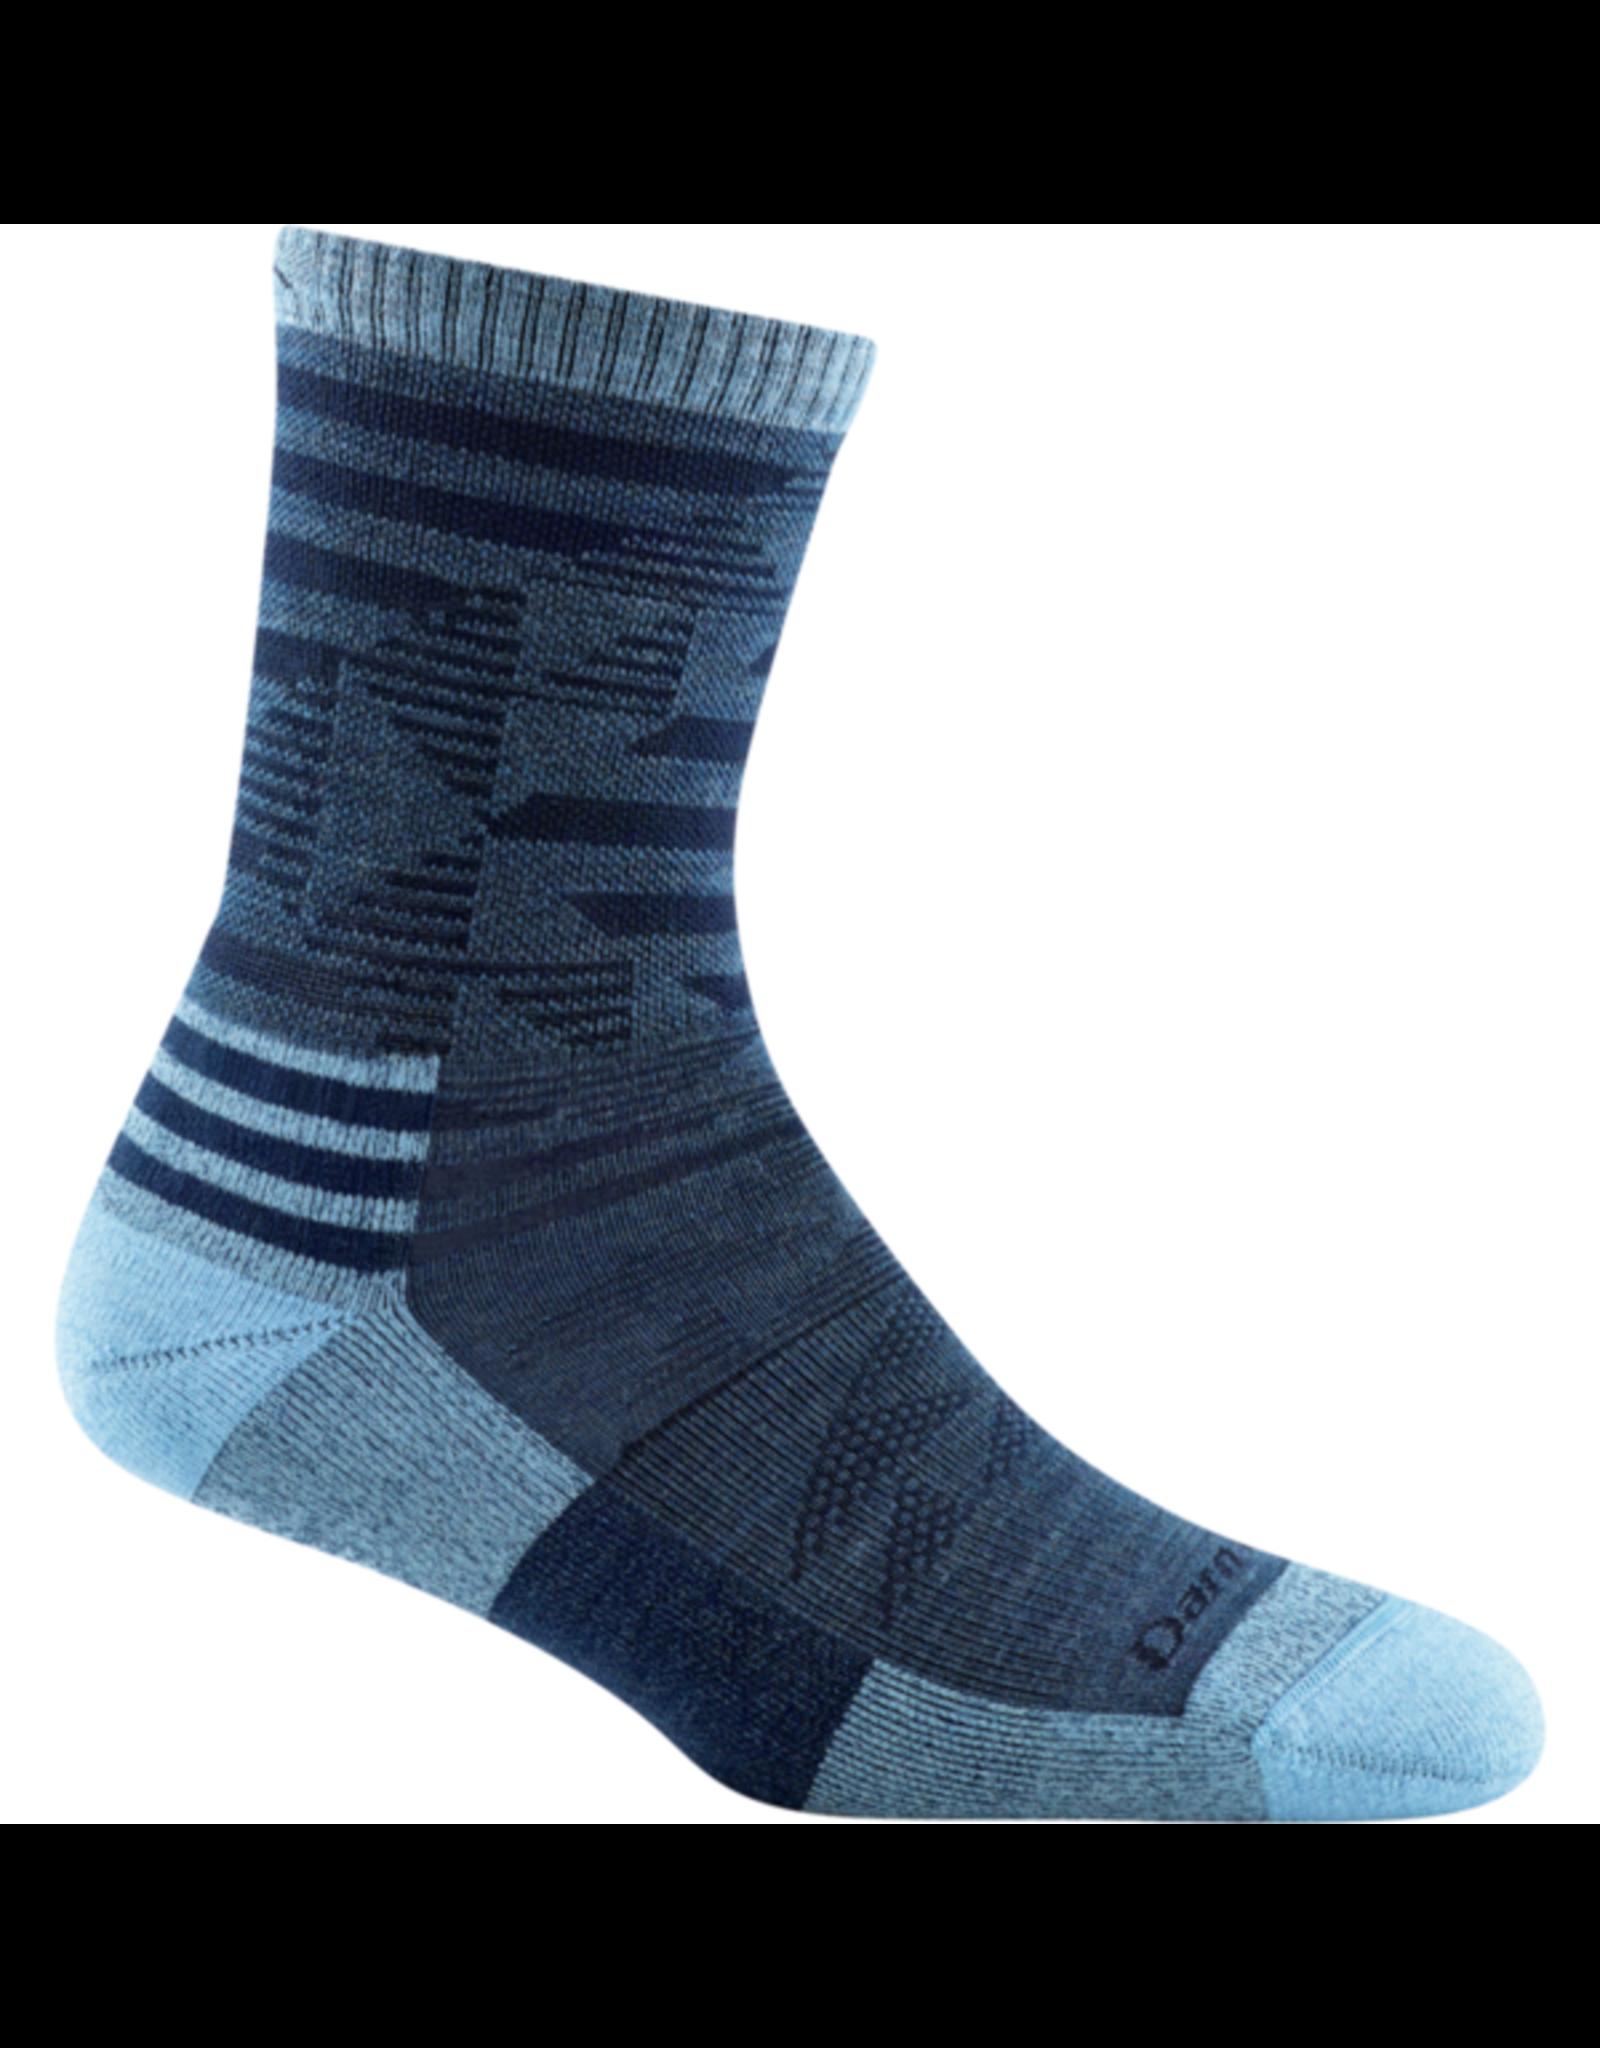 Darn Tough Darn Tough Women's Ceres Micro Crew Lightweight Cushion Sock